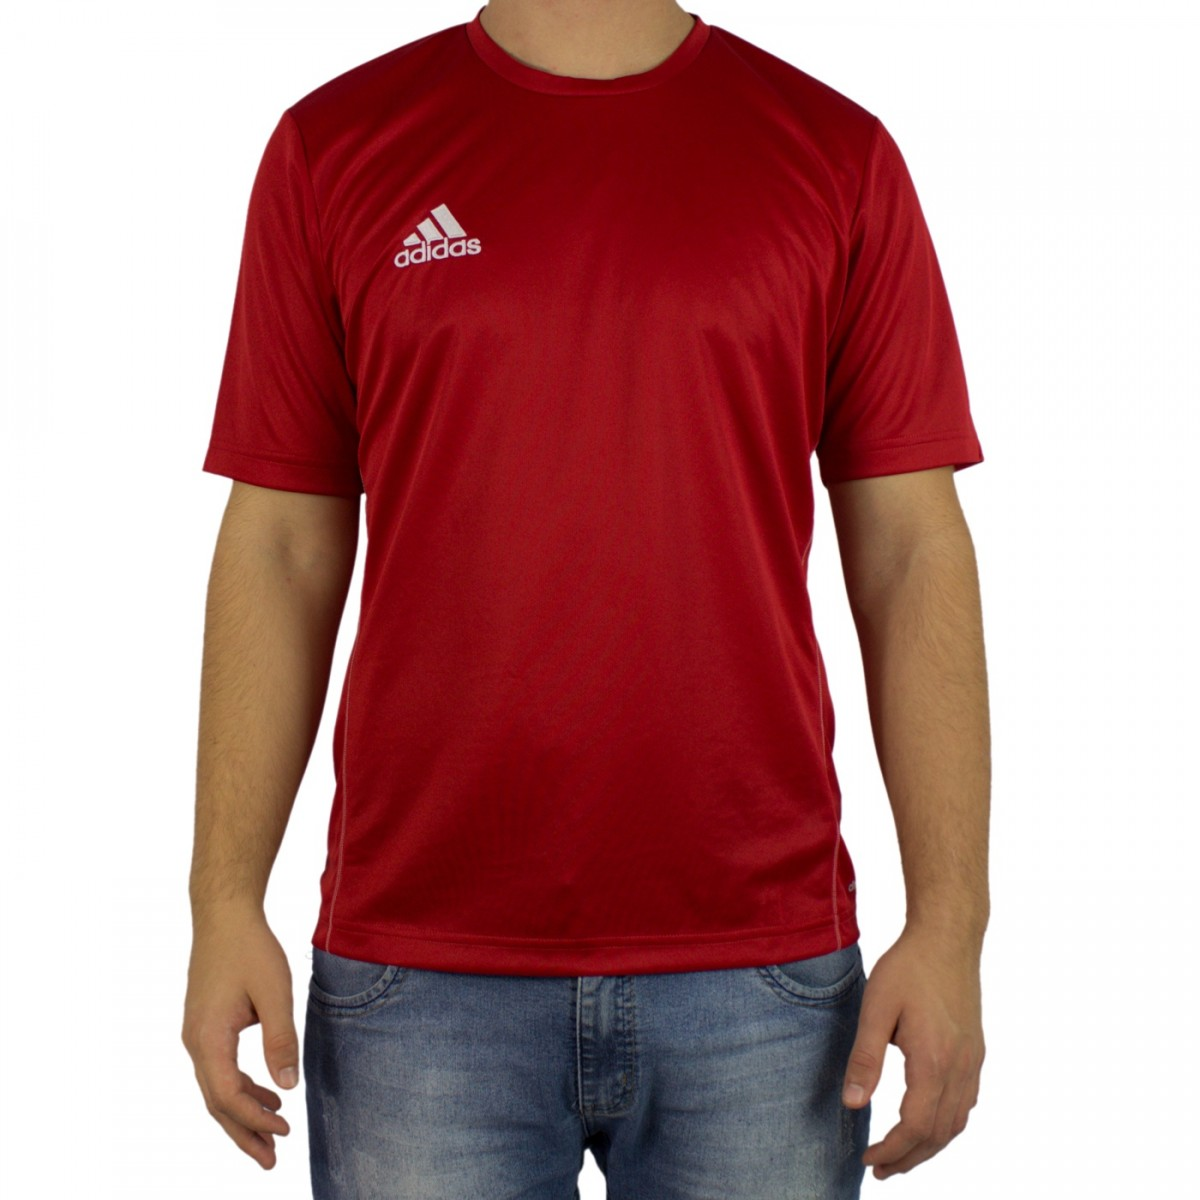 d851dc2505d Bizz Store - Camiseta Masculina Adidas Core 15 Cinza Treino